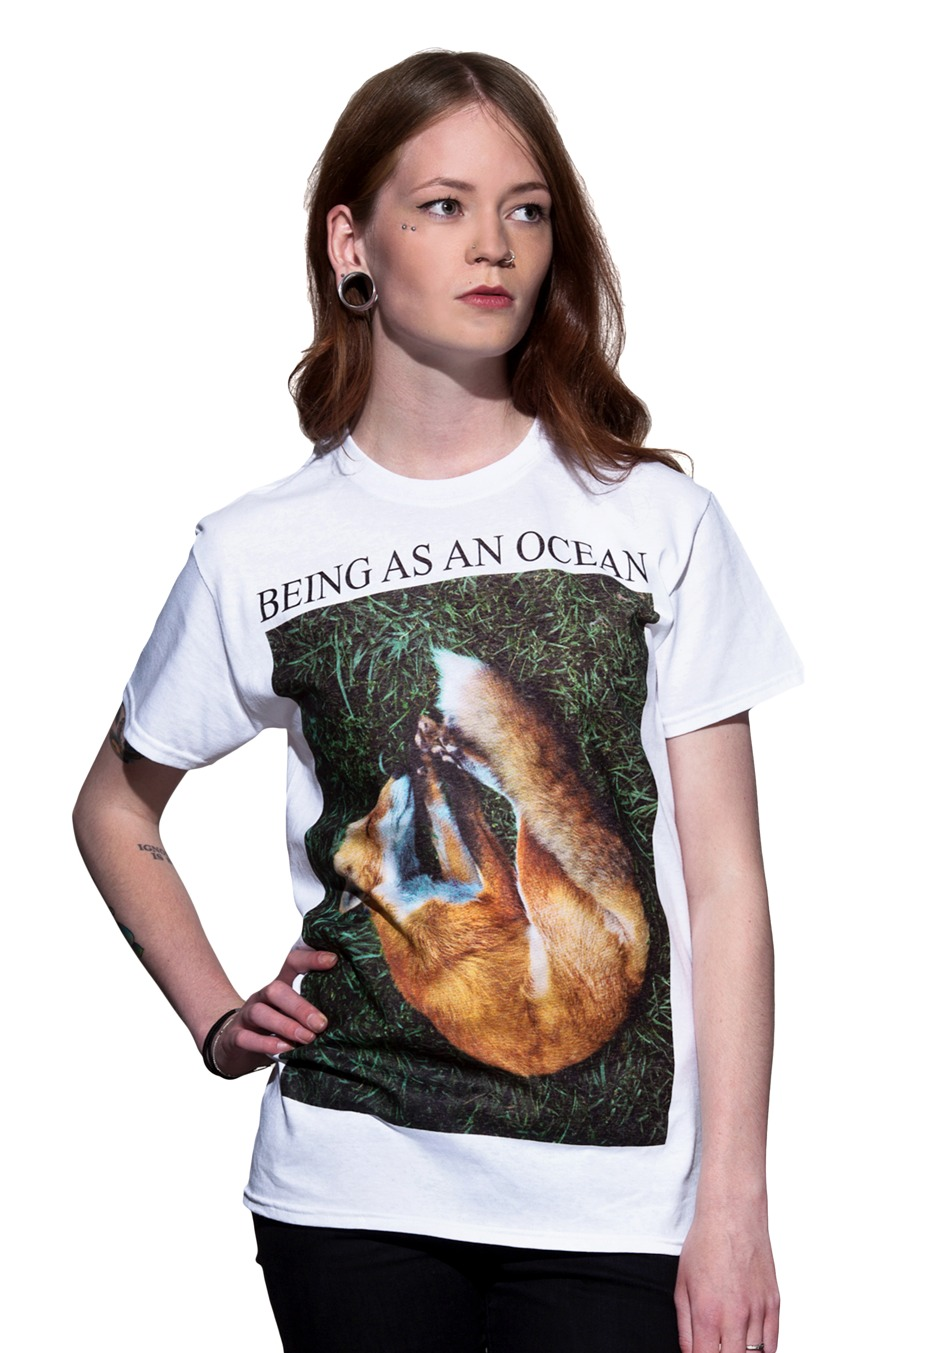 Being As An Ocean - Sleeping Fox White - T-Shirt Merch Store - Impericon.com UK